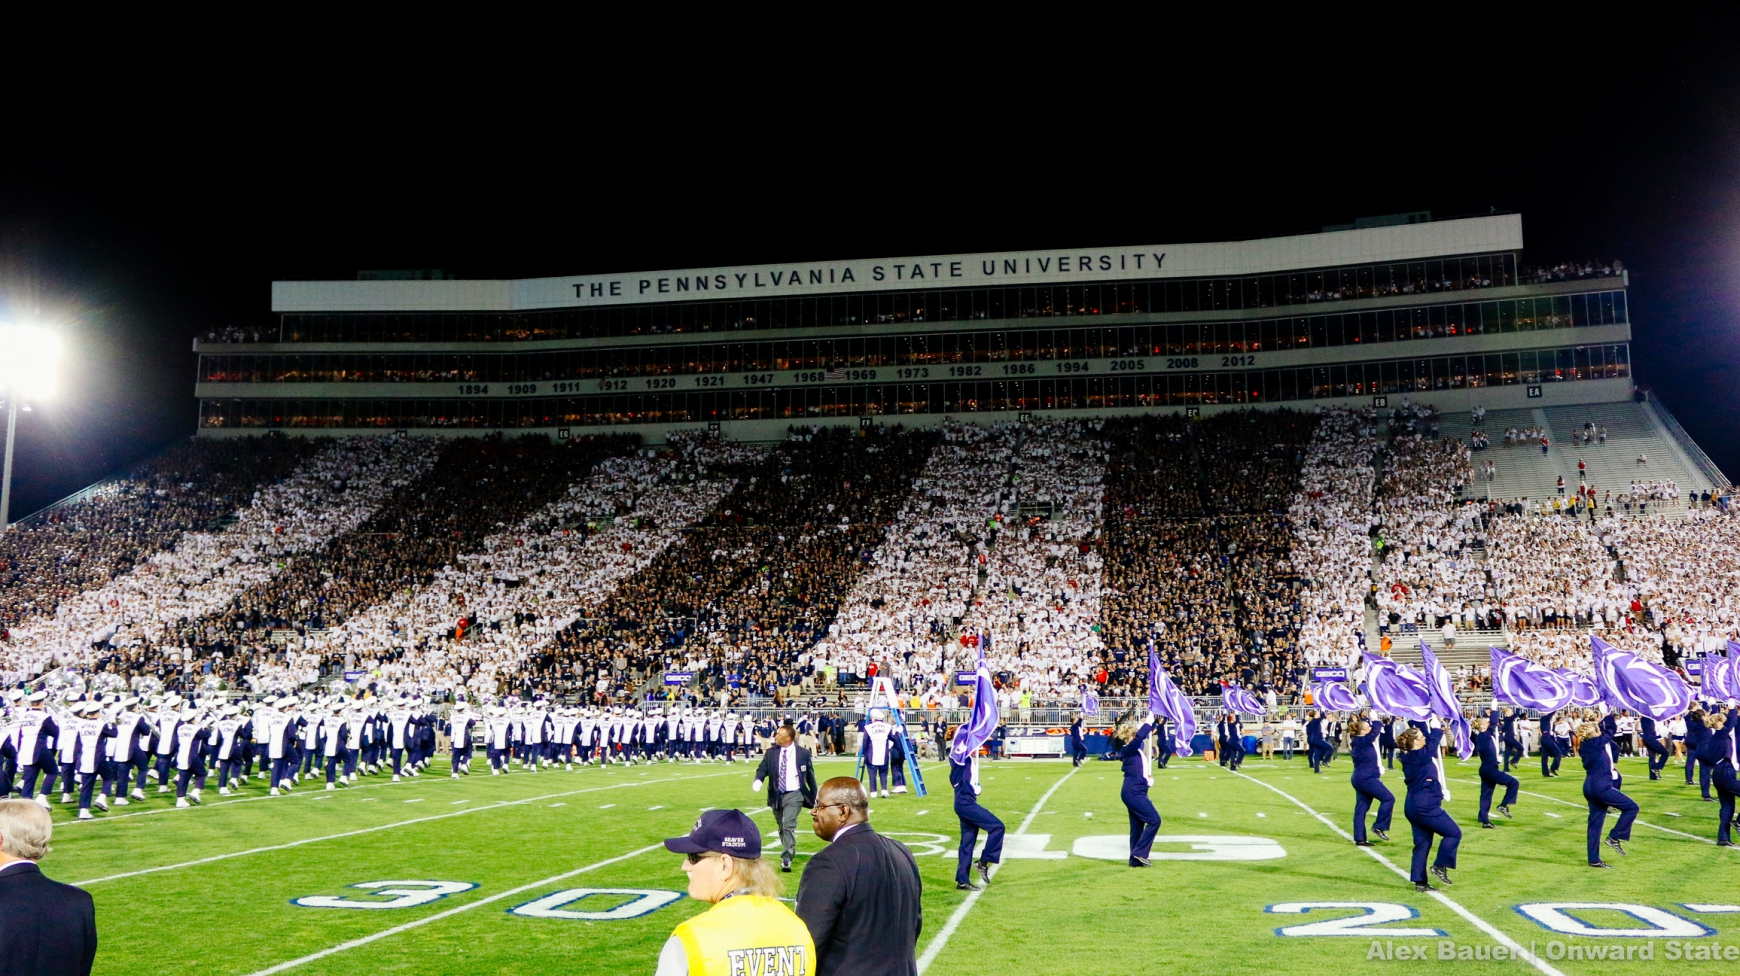 Penn State Football Announces List of 2018 Game Themes